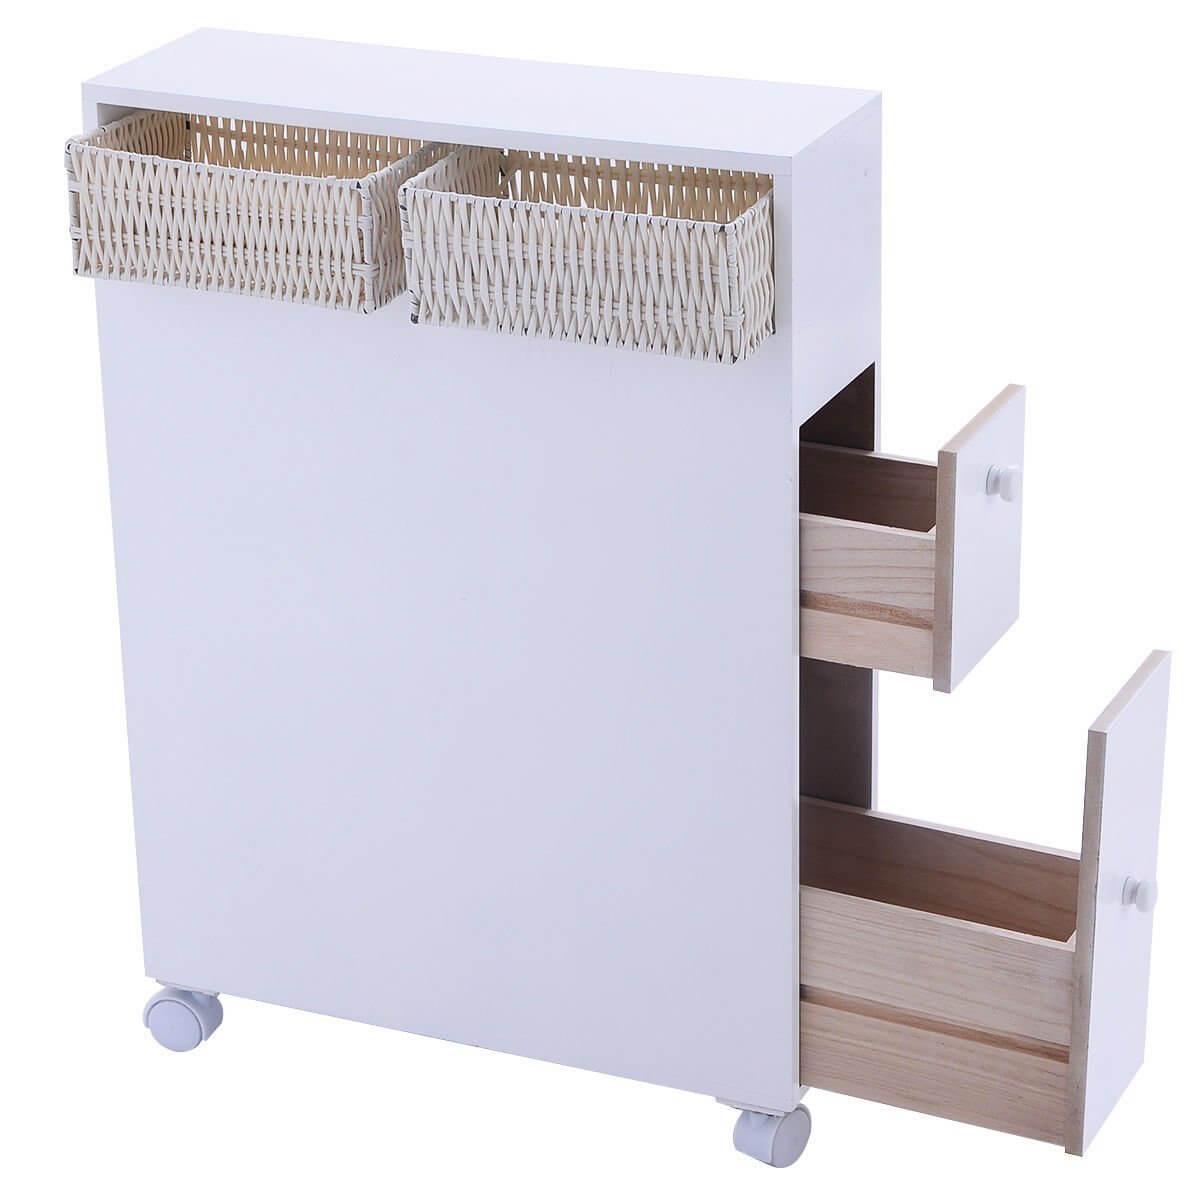 Tangkula Wood Floor Bathroom Storage Rolling Cabinet Holder